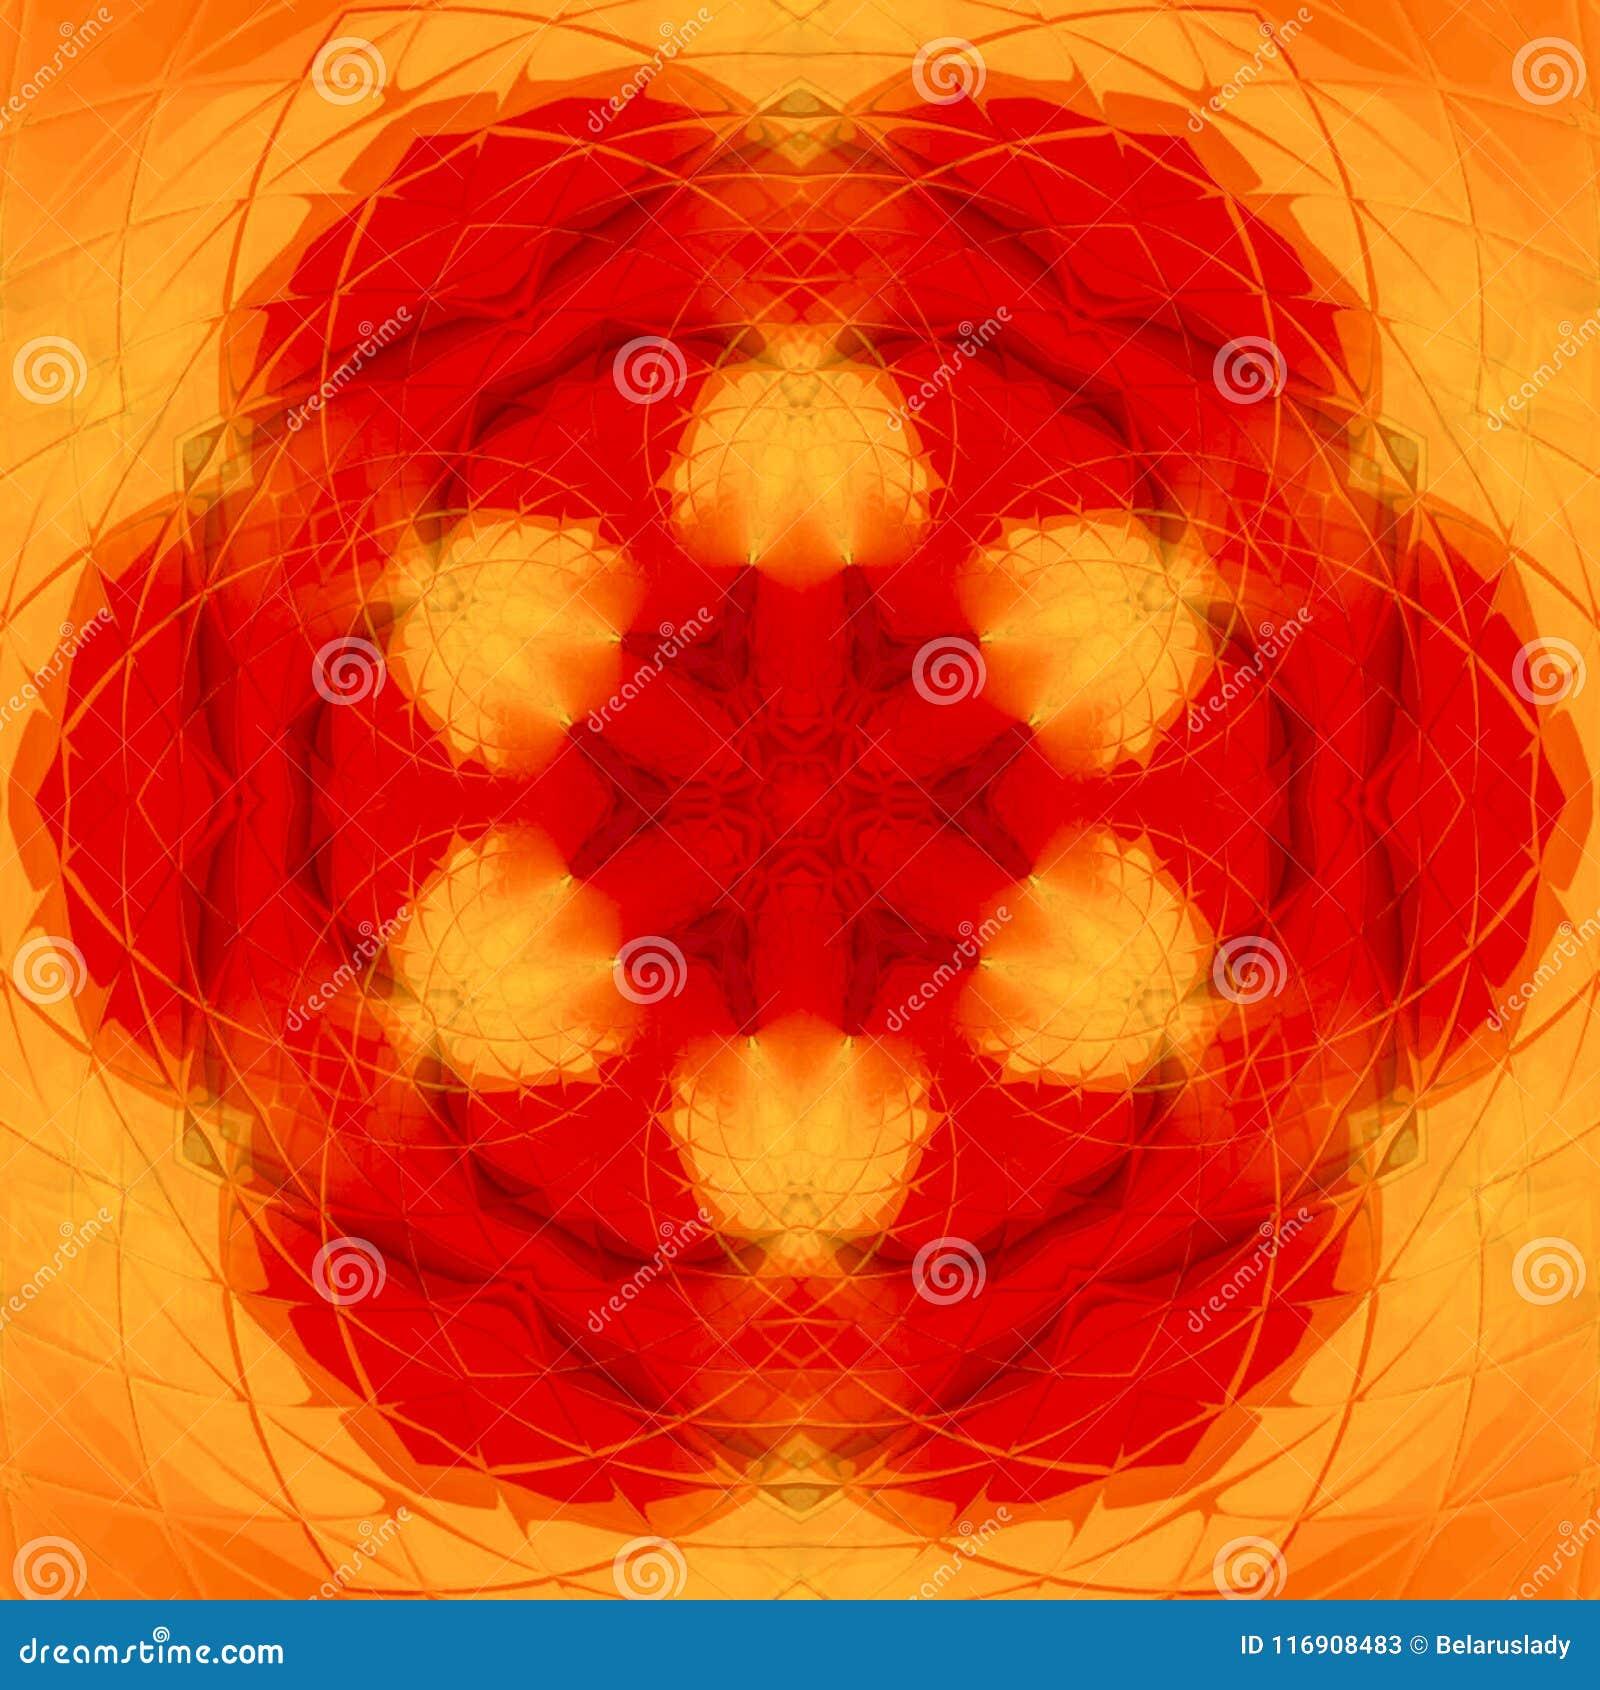 La naranja abstracta pintó el caleidoscopio, imagen de la mandala del fuego